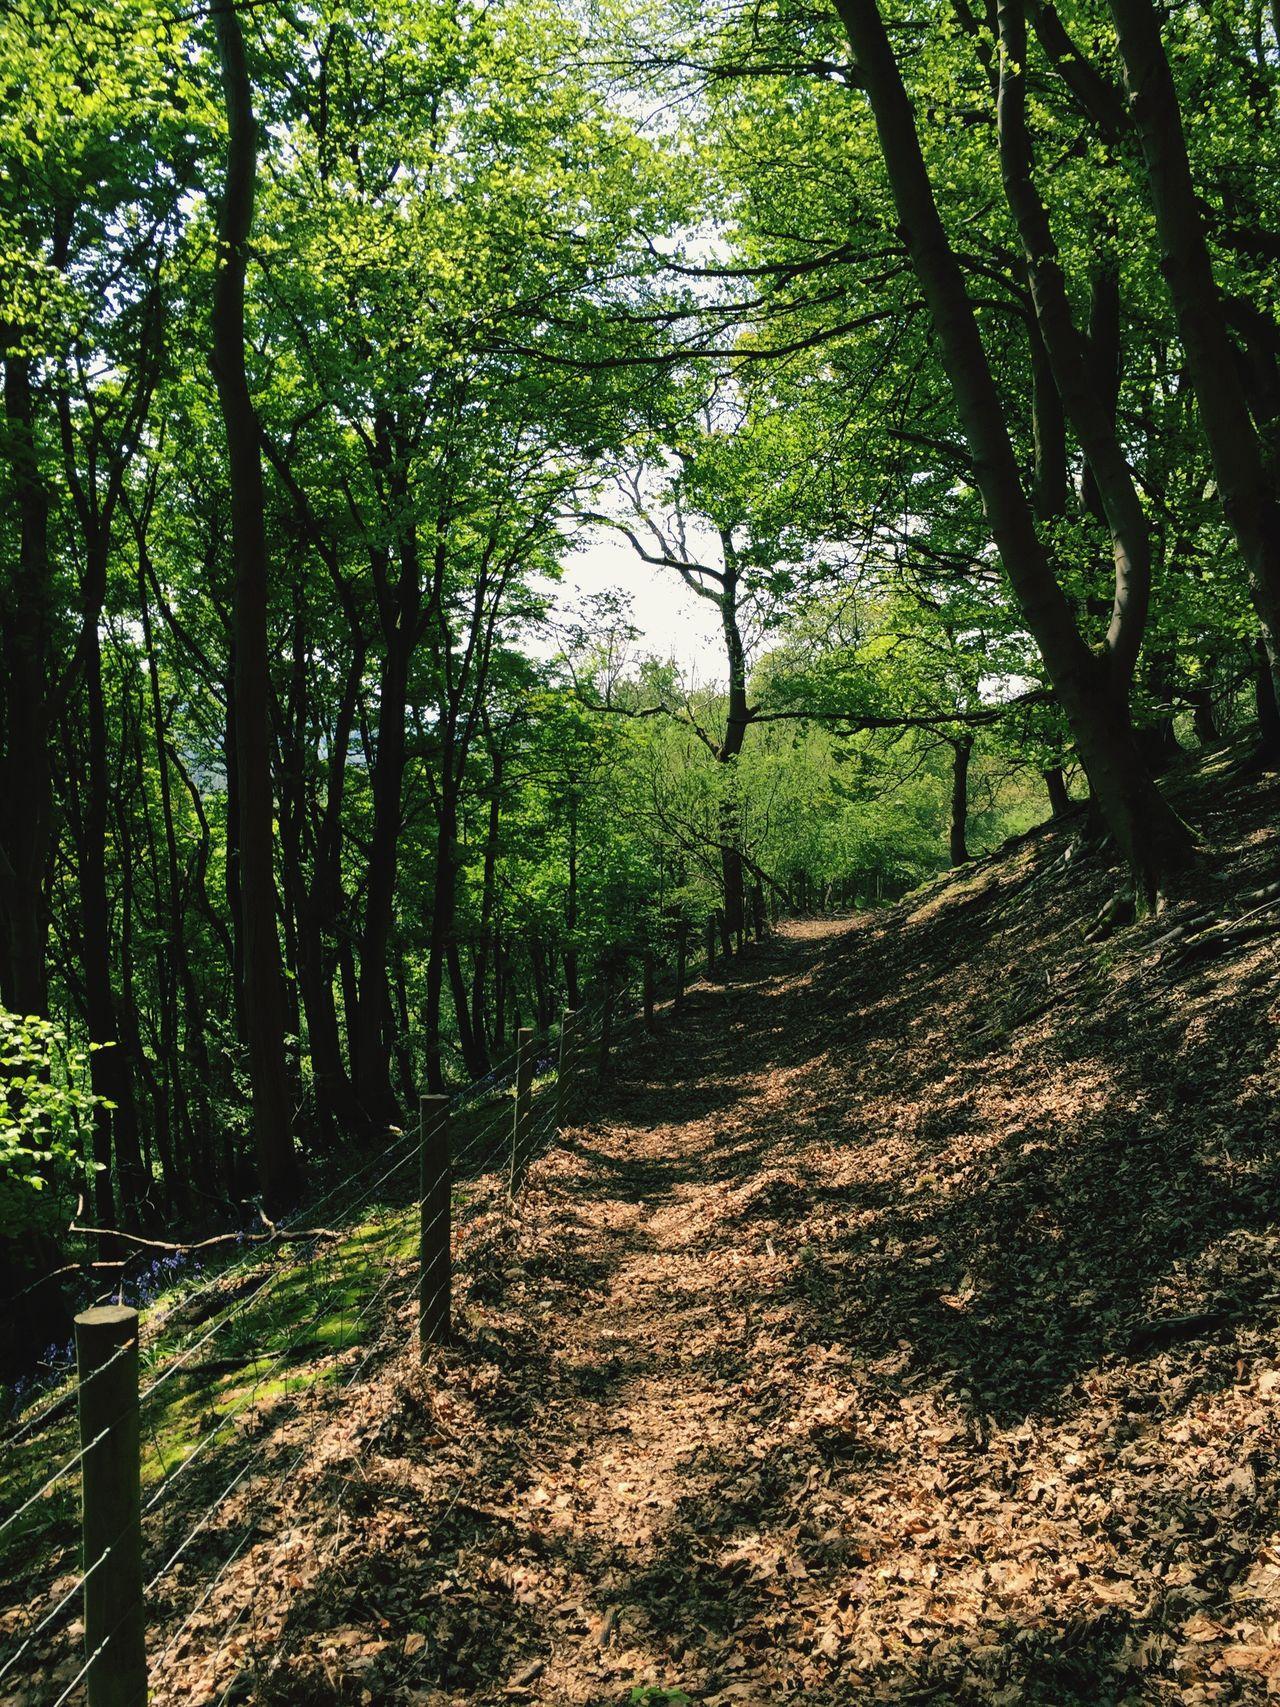 Tree Scenics Footpath Nature Dirt Road WoodLand Outdoors